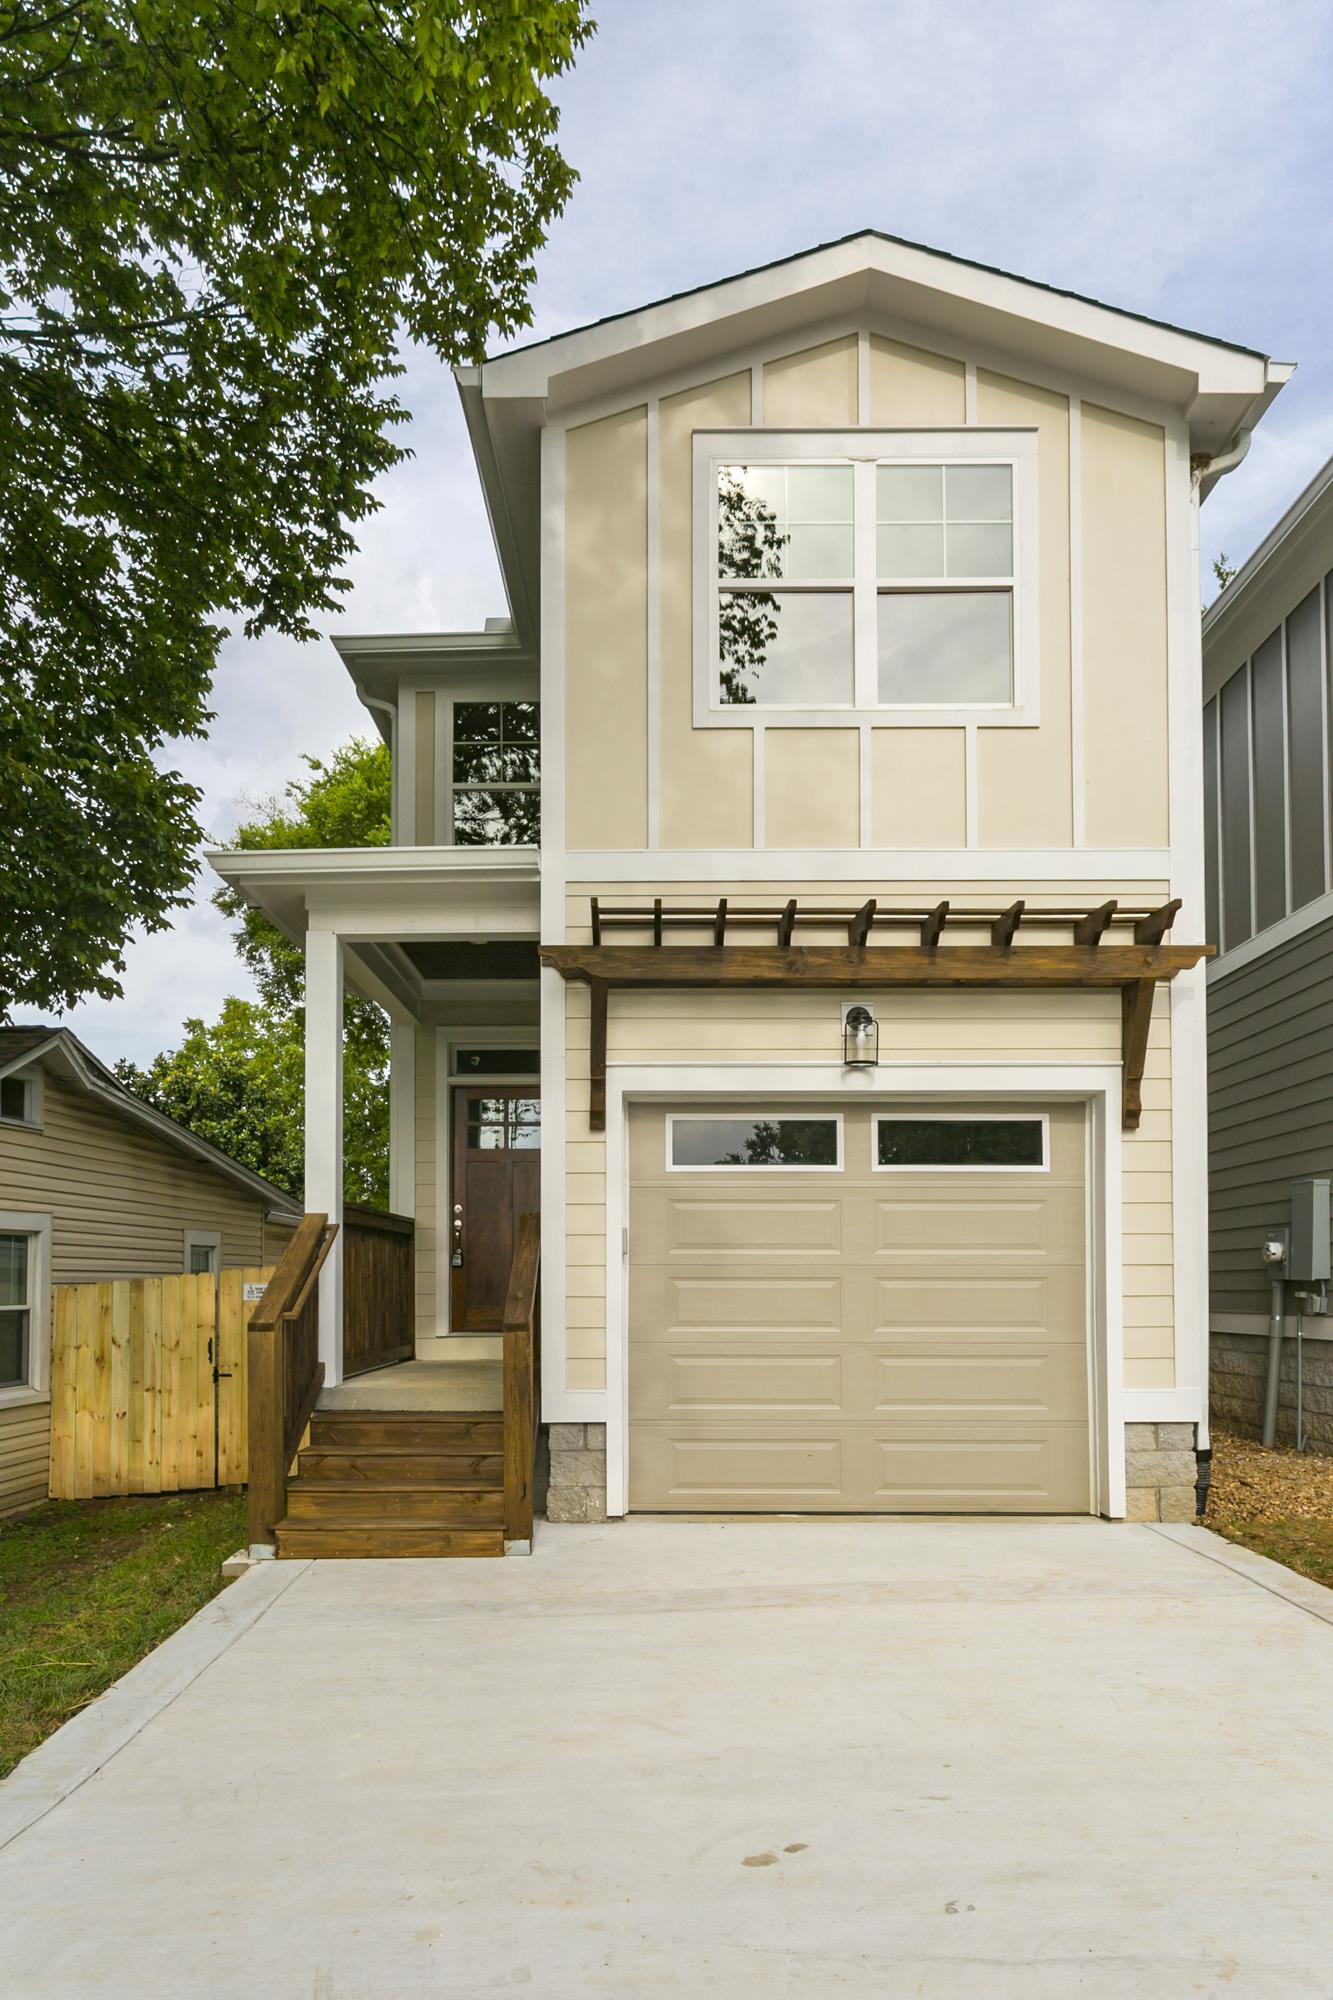 2220A Kline Ave, Nashville, TN 37211 - Nashville, TN real estate listing